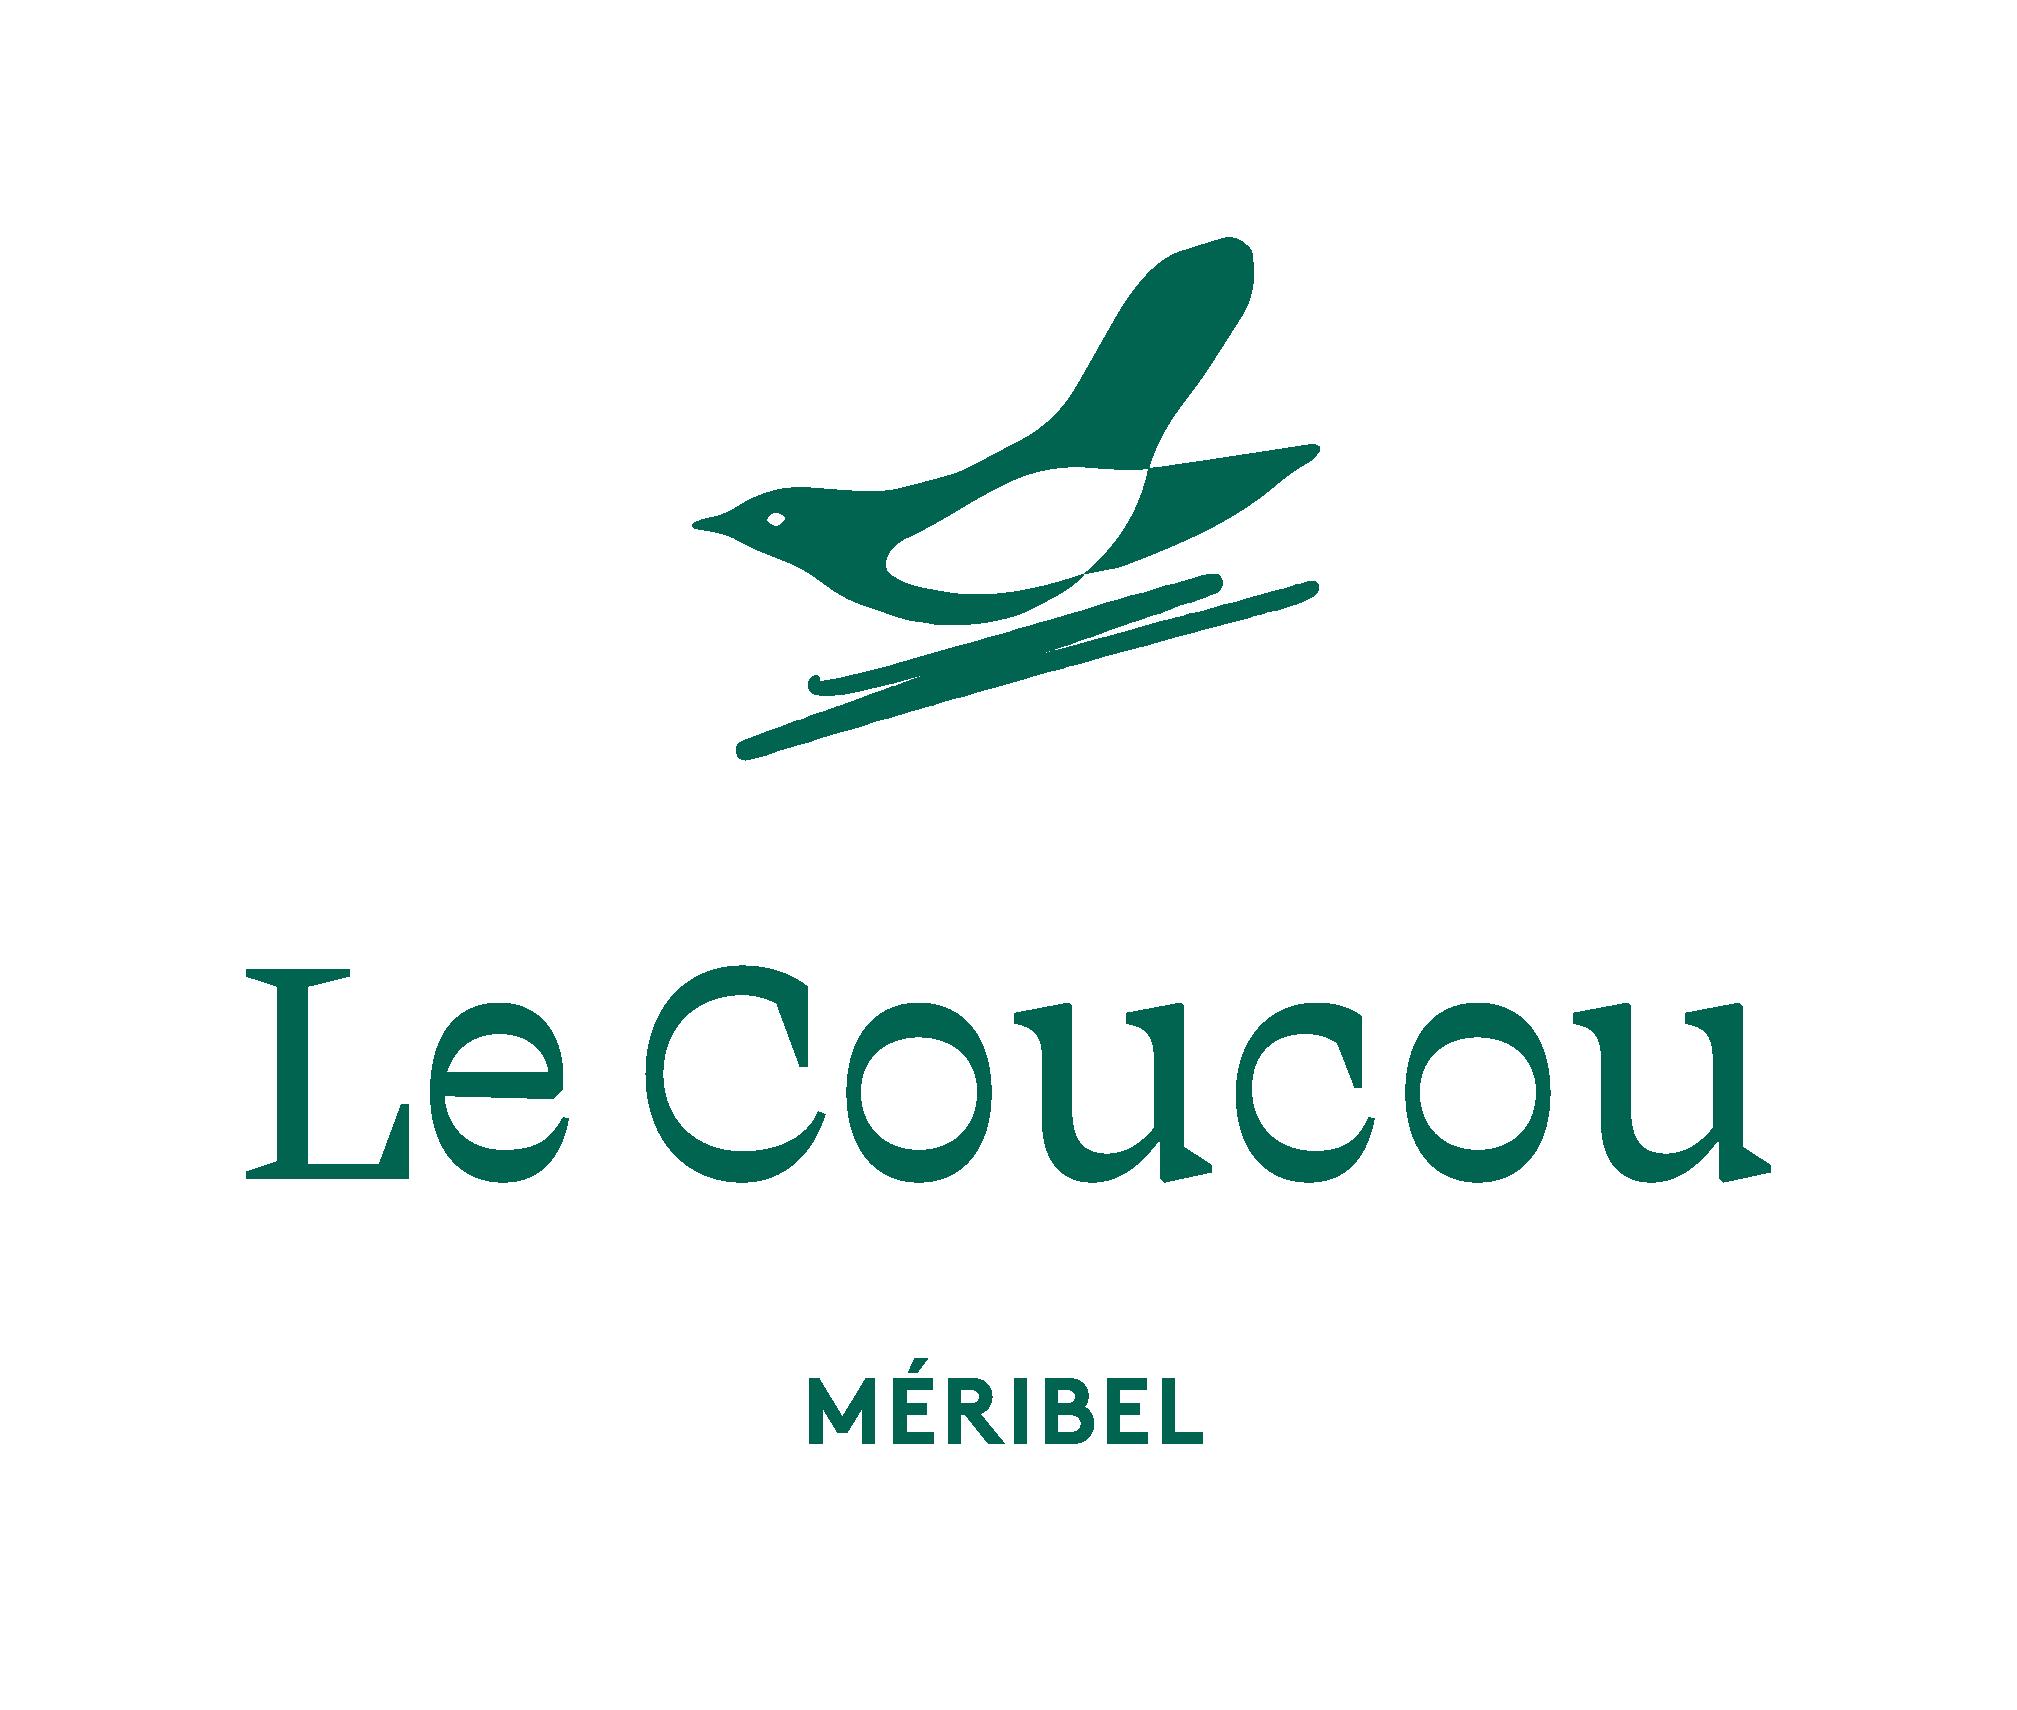 LeCoucou_LOGO_PANTONE_336-01